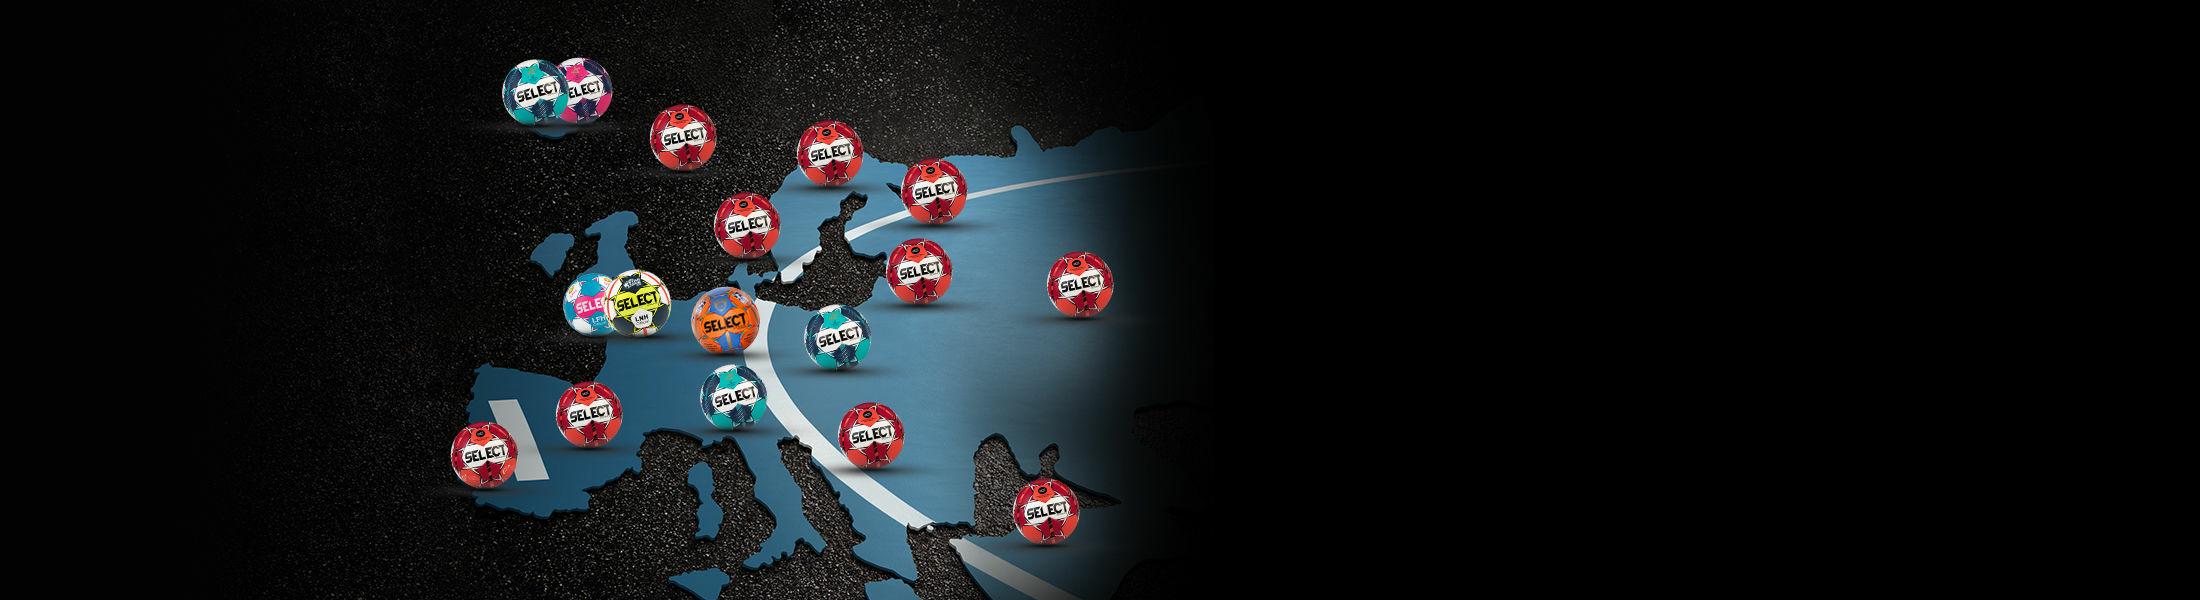 handball_match_balls_on_map_2020